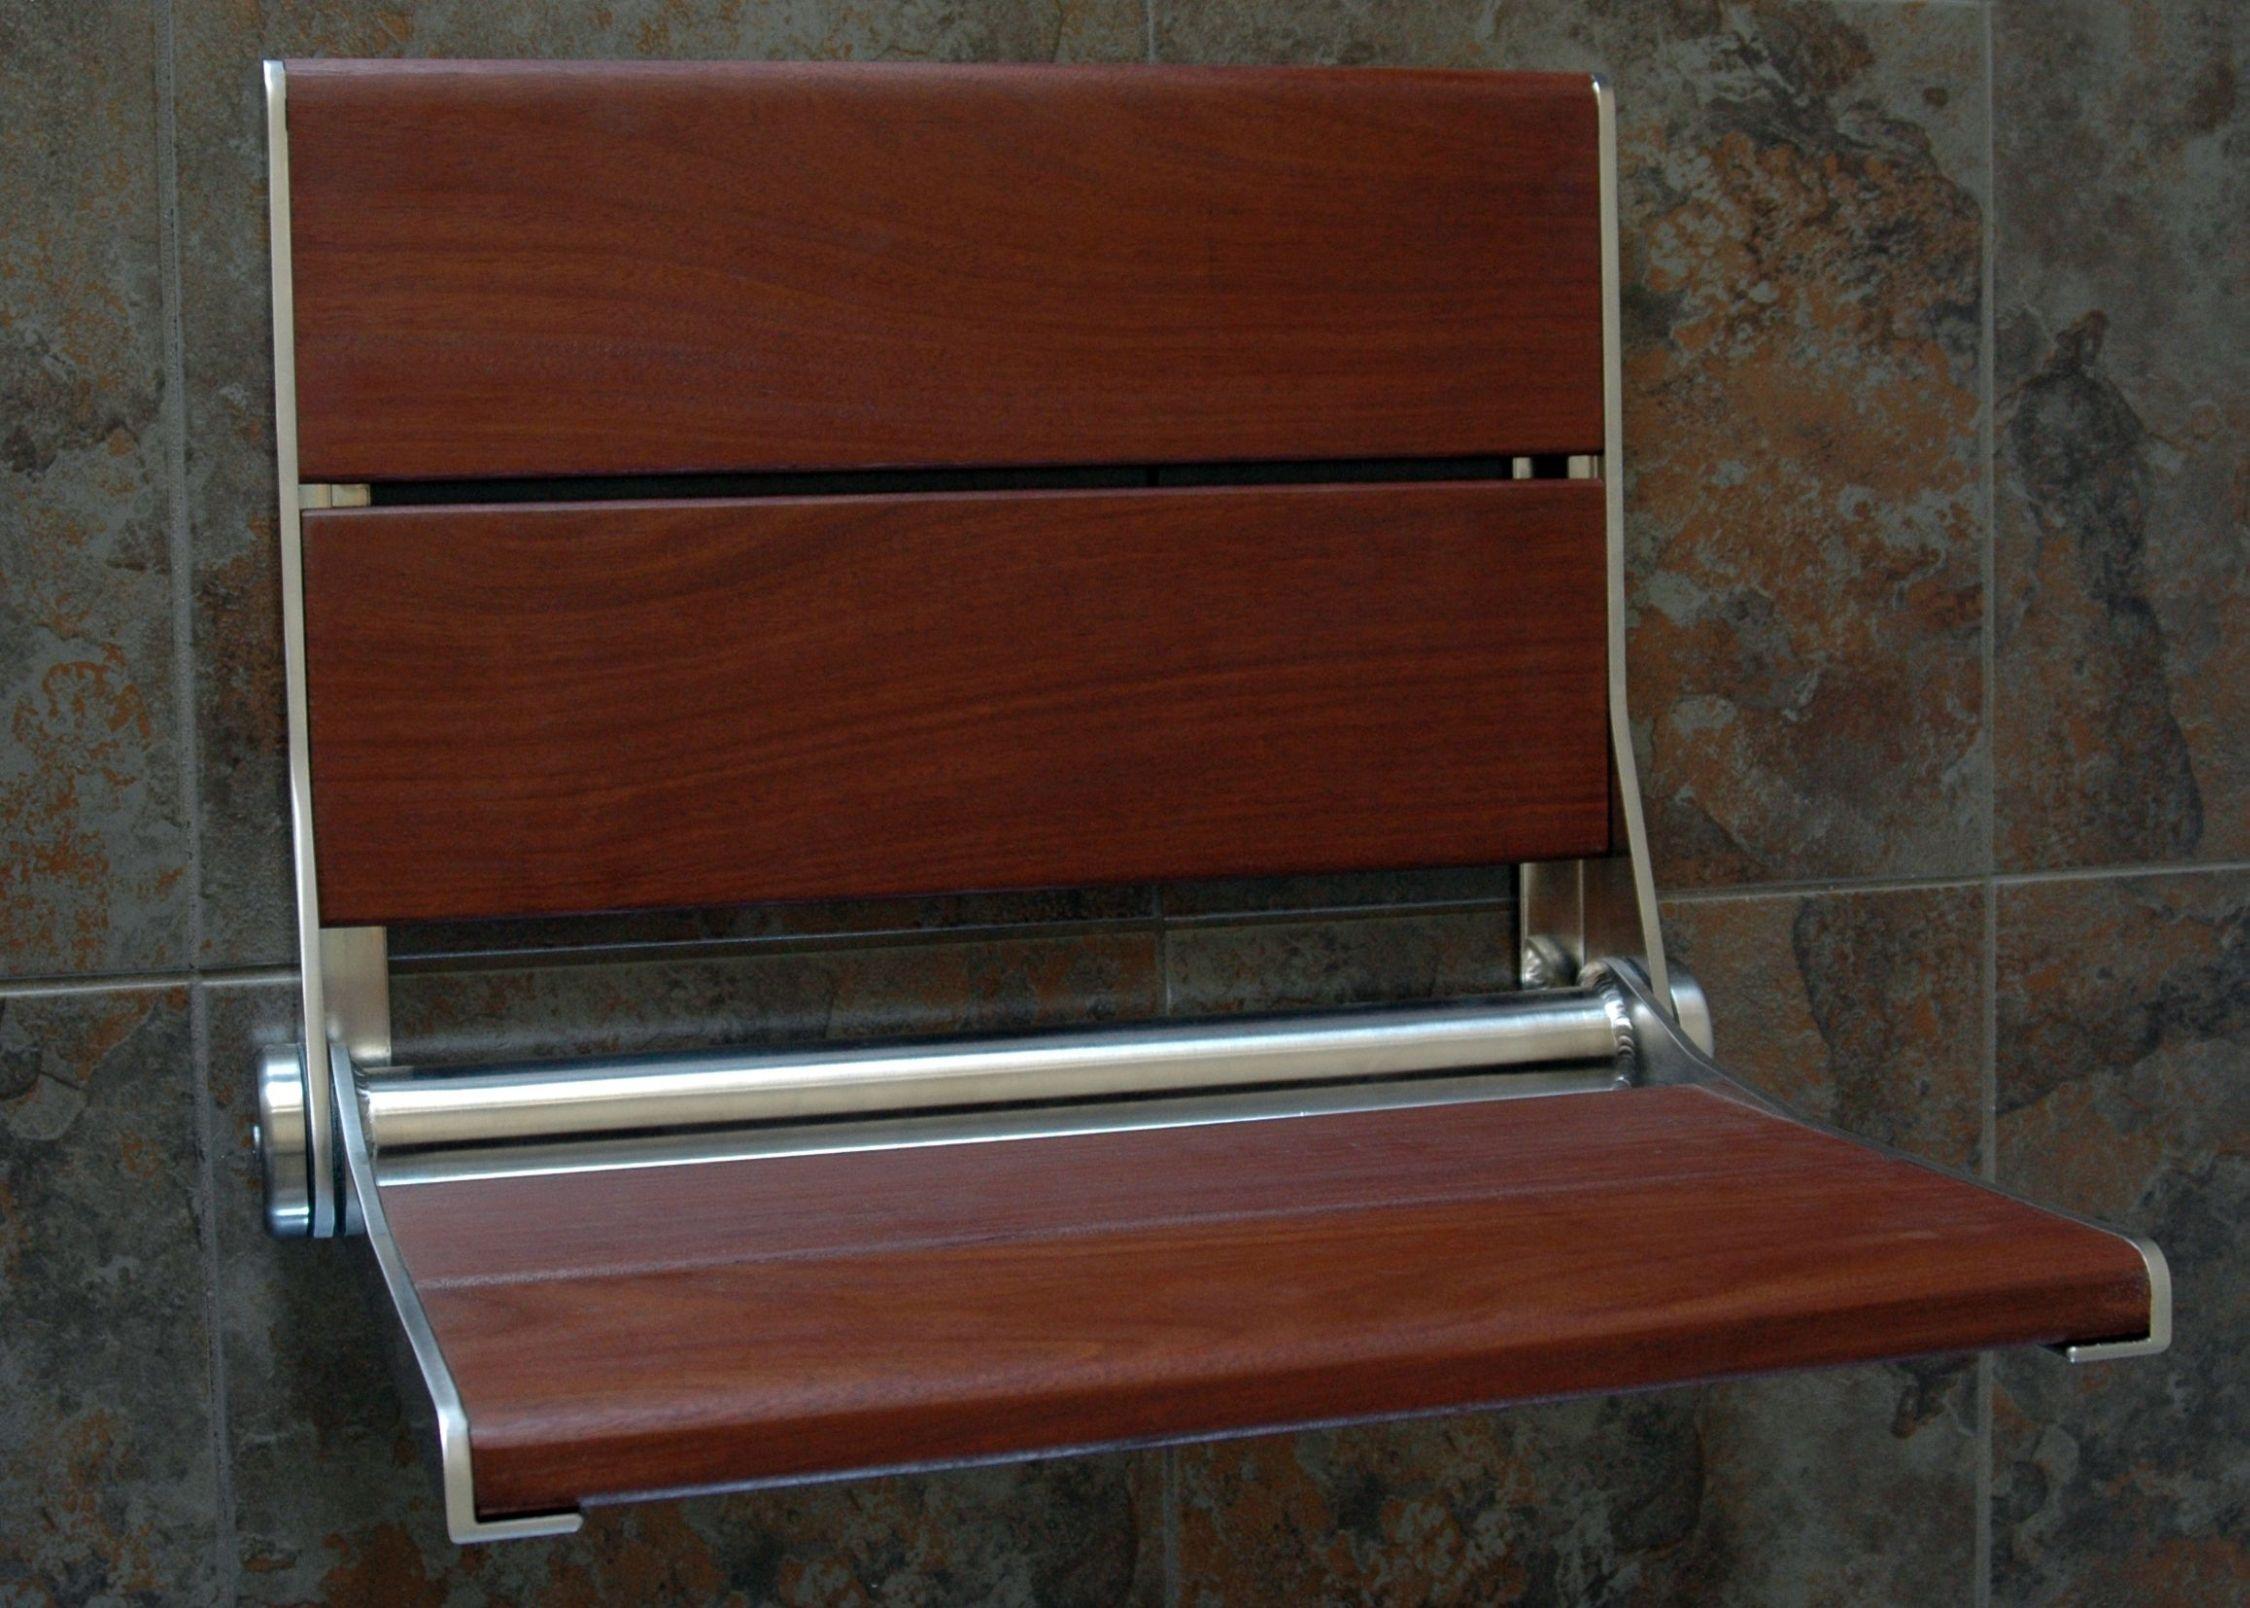 HealthCraft-Serena Bariatric self-folding bath seat. BA6-509 ...